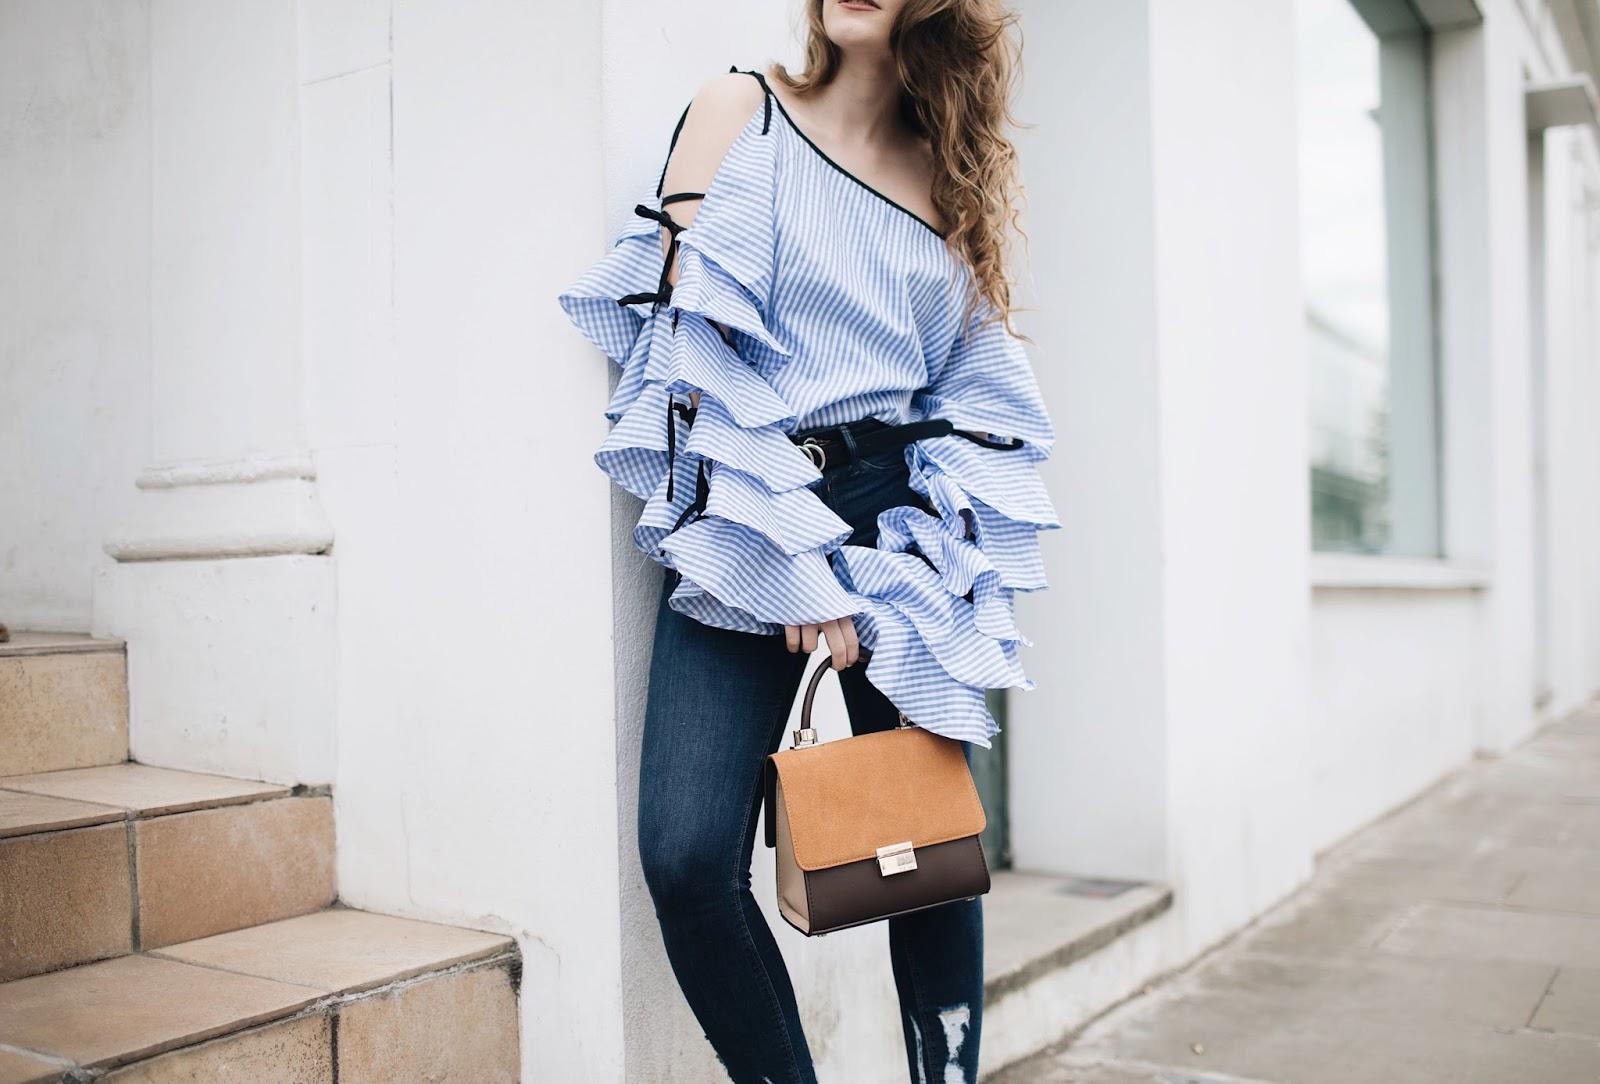 shein clothing, blue gingham shirt, gingham shirt women, ruffles galore, gingham blouse, london based fashion blogger, london based style blogger, london based petite blogger, london petite style blogger, petite blogger, petite style blogger, gingham trend, gingham top, gingham blouse, shein gingham top, shein gingham blouse, ruffled blouse, gingham ruffled top, zara sale, zara bag, gucci belt, gucci fake, style blogger, gucci dupe